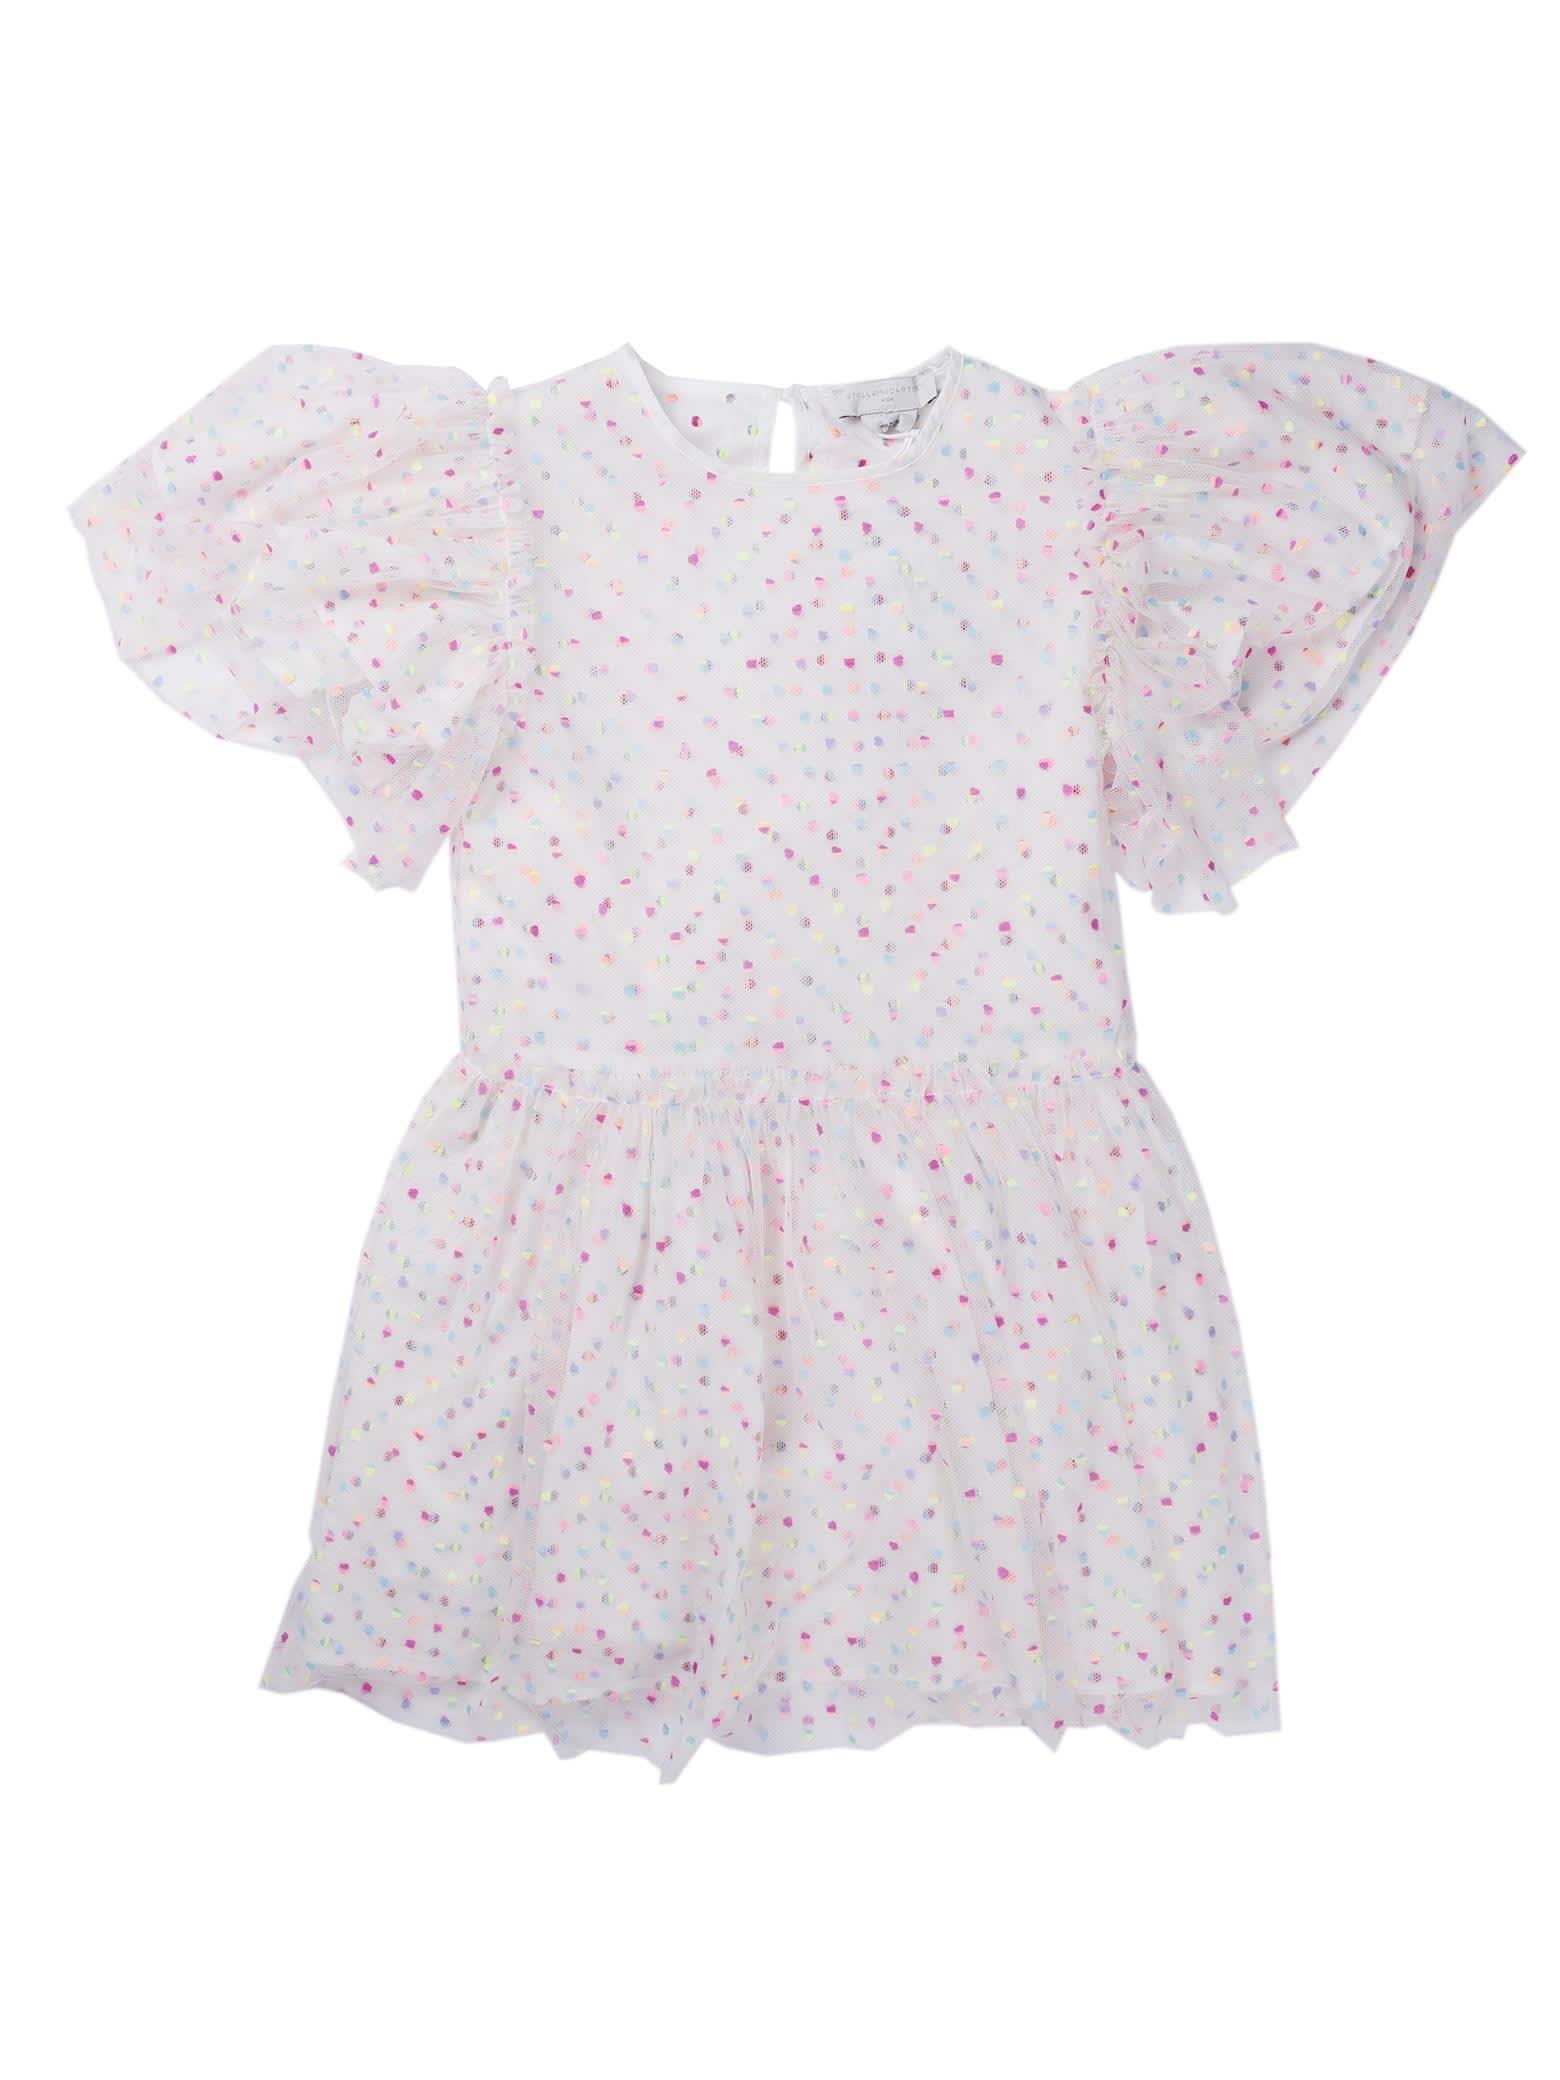 Buy Stella McCartney Kids Embro Dots Tulle Dress online, shop Stella McCartney Kids with free shipping